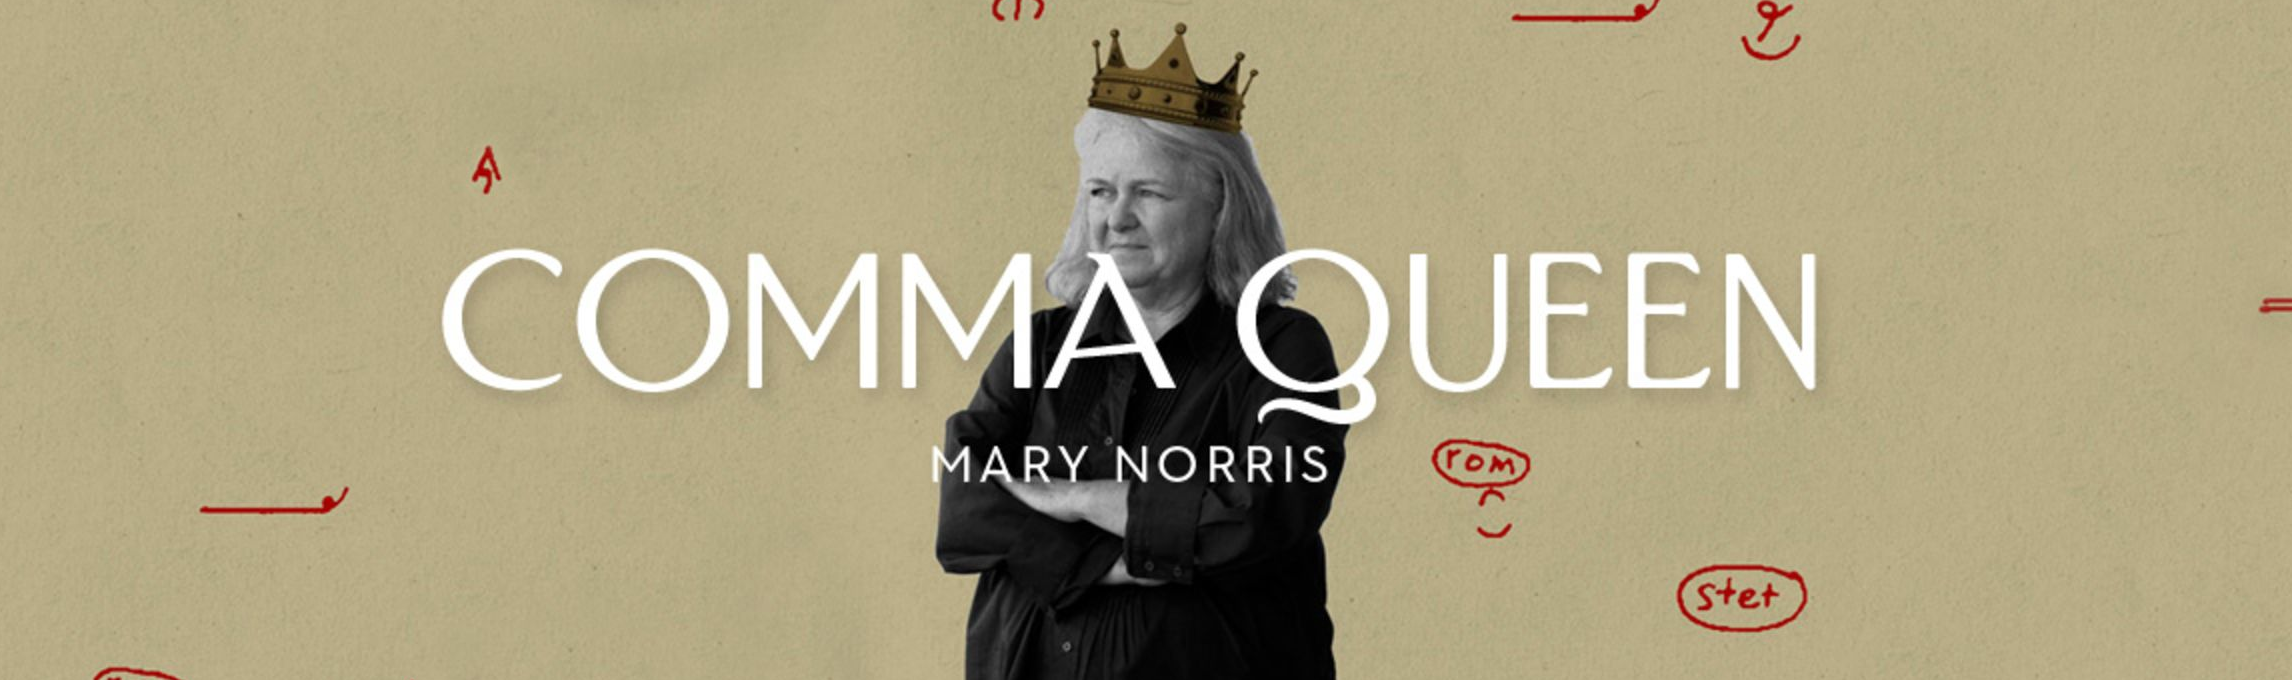 The Comma Queen